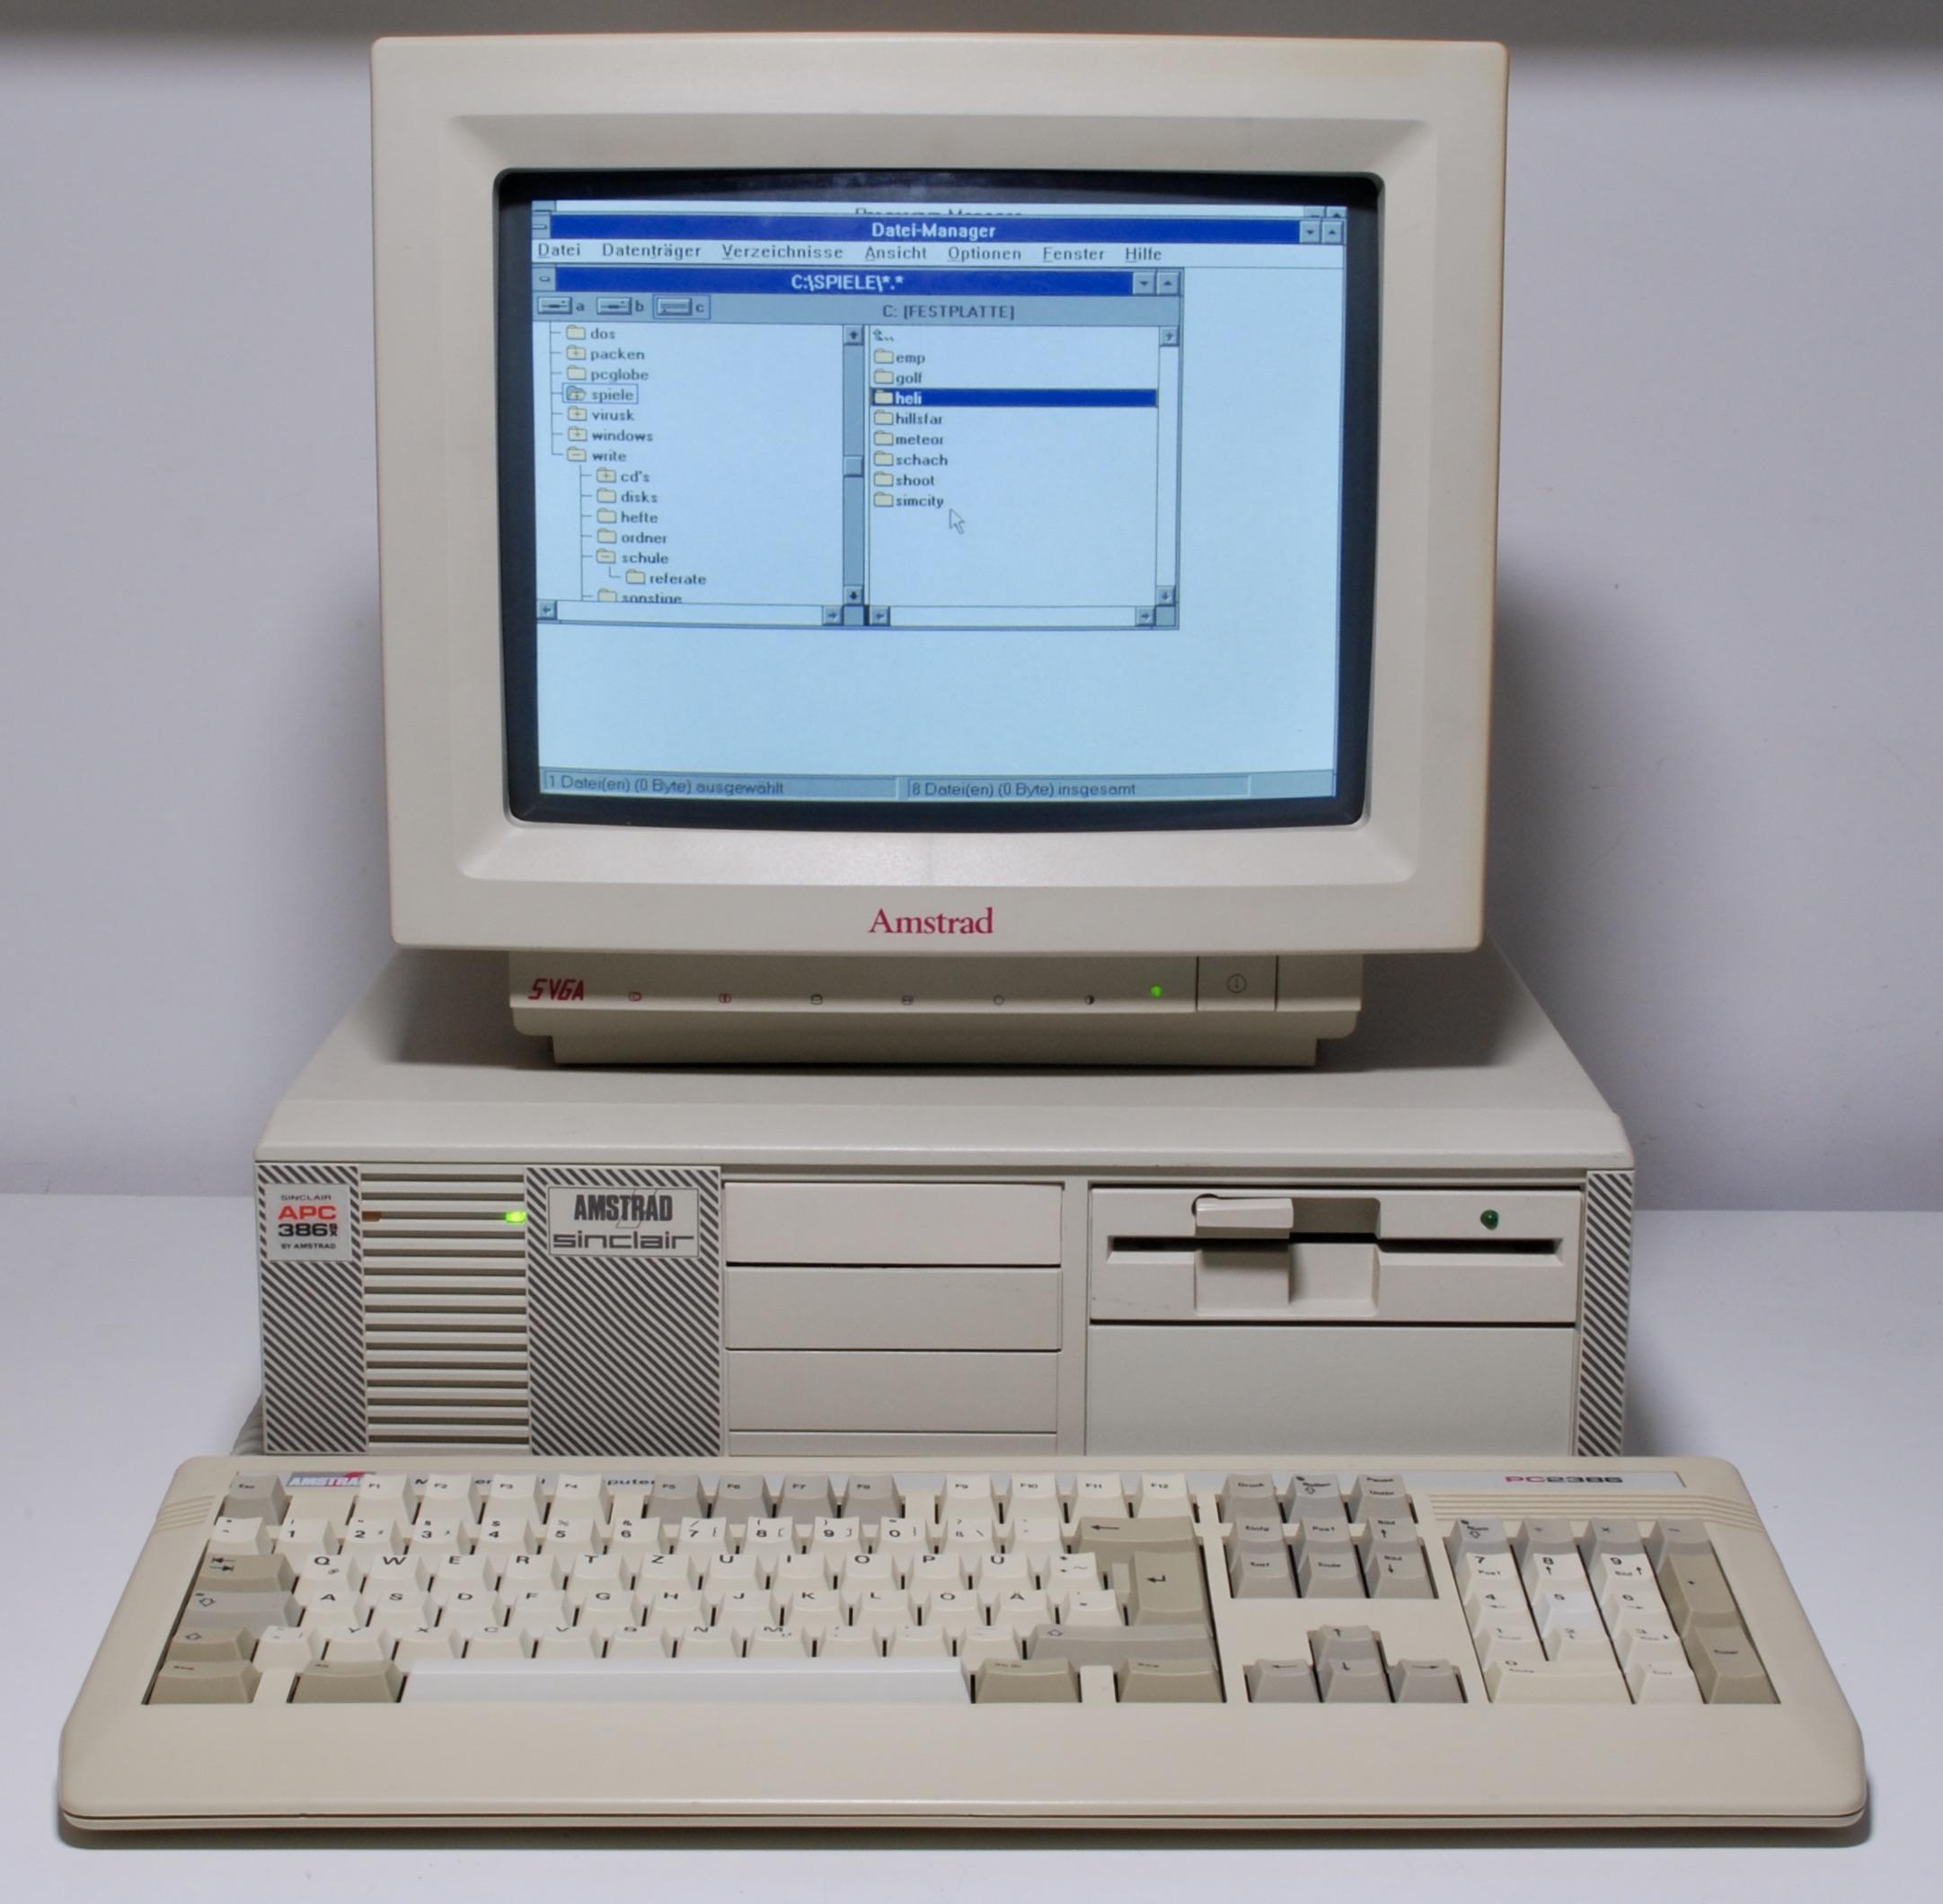 amstrad 14m28 monitor old crap vintage computing amstrad 14m28 monitor old crap